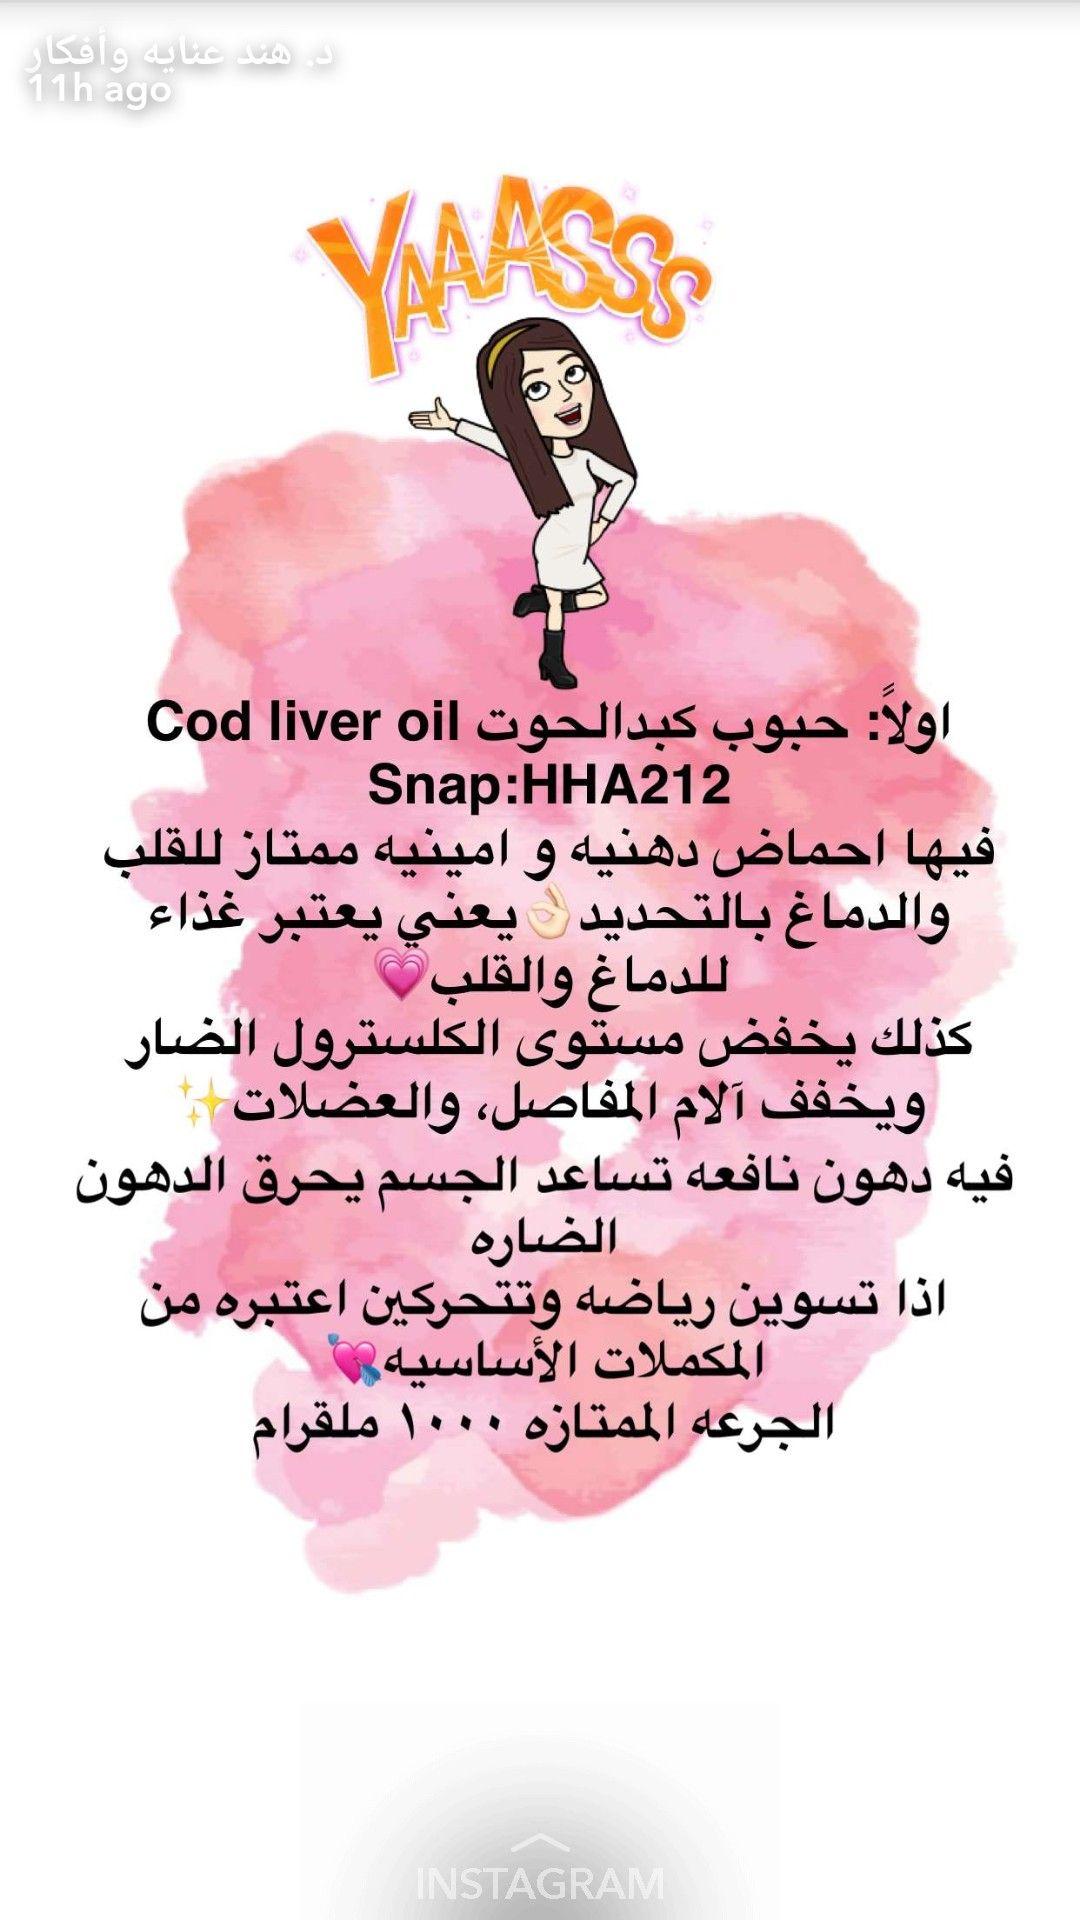 Pin By Hesss On عنايه Health Skin Care Skin Health Health And Wellbeing